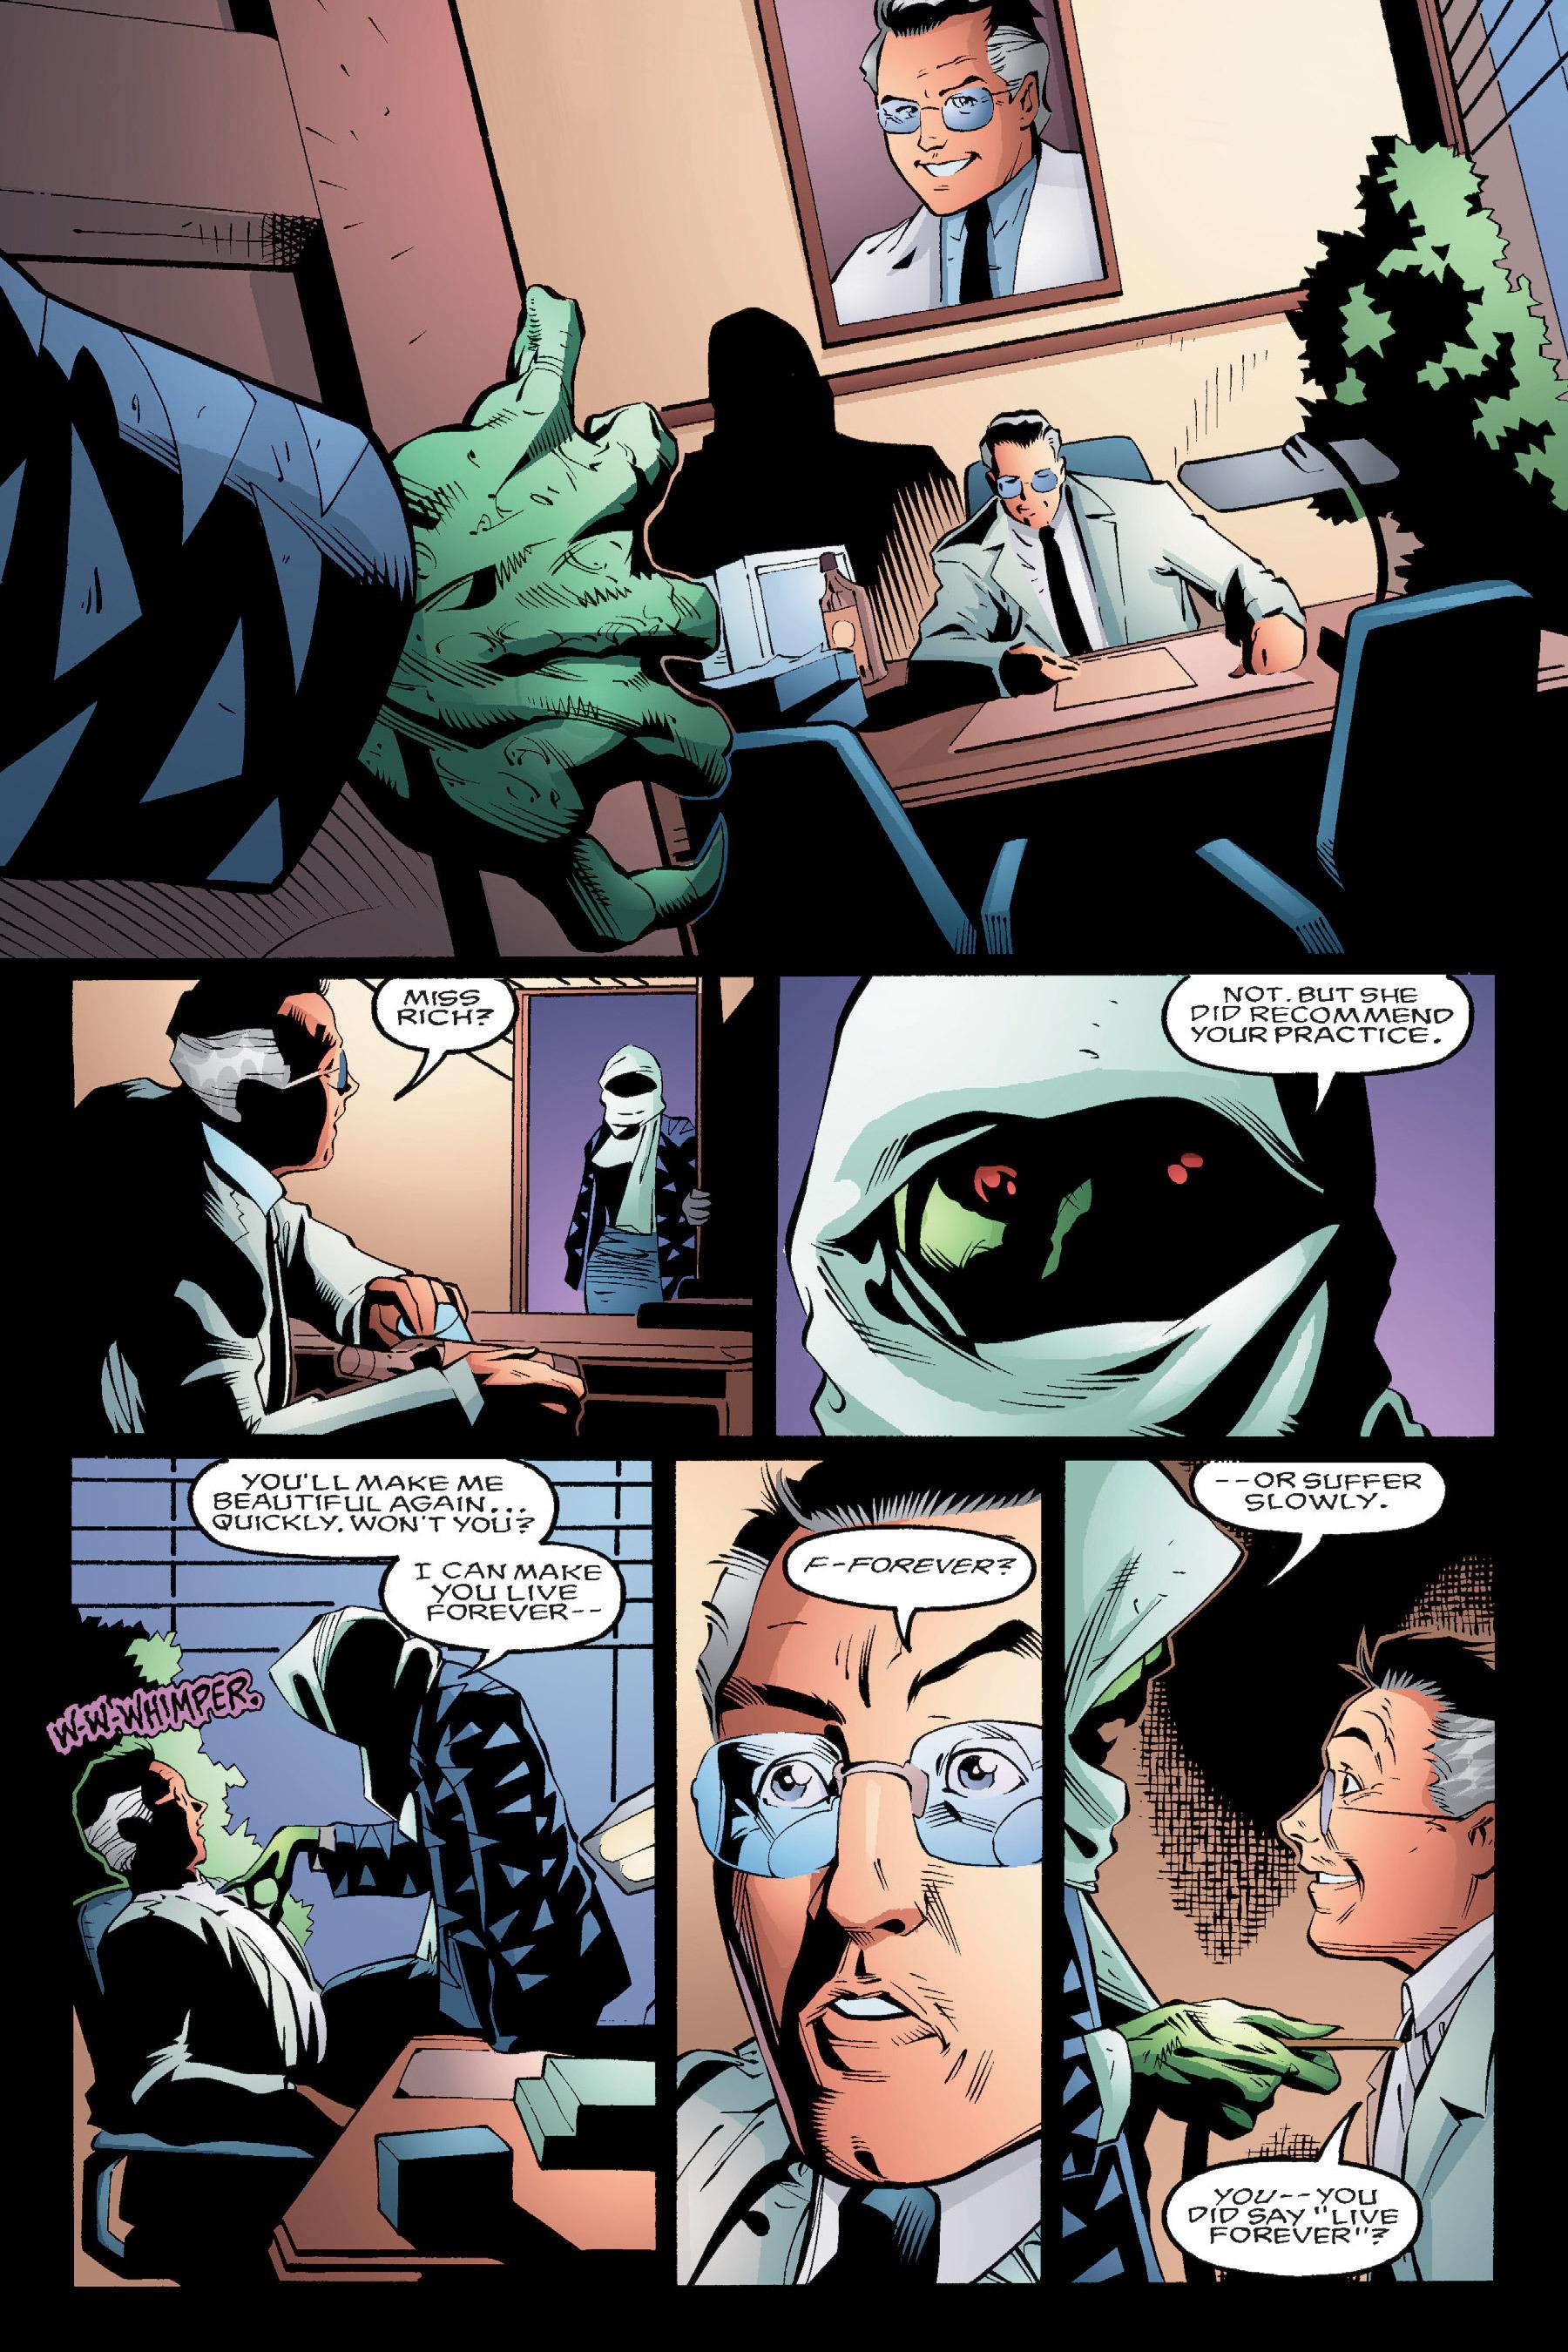 Read online Buffy the Vampire Slayer: Omnibus comic -  Issue # TPB 4 - 20